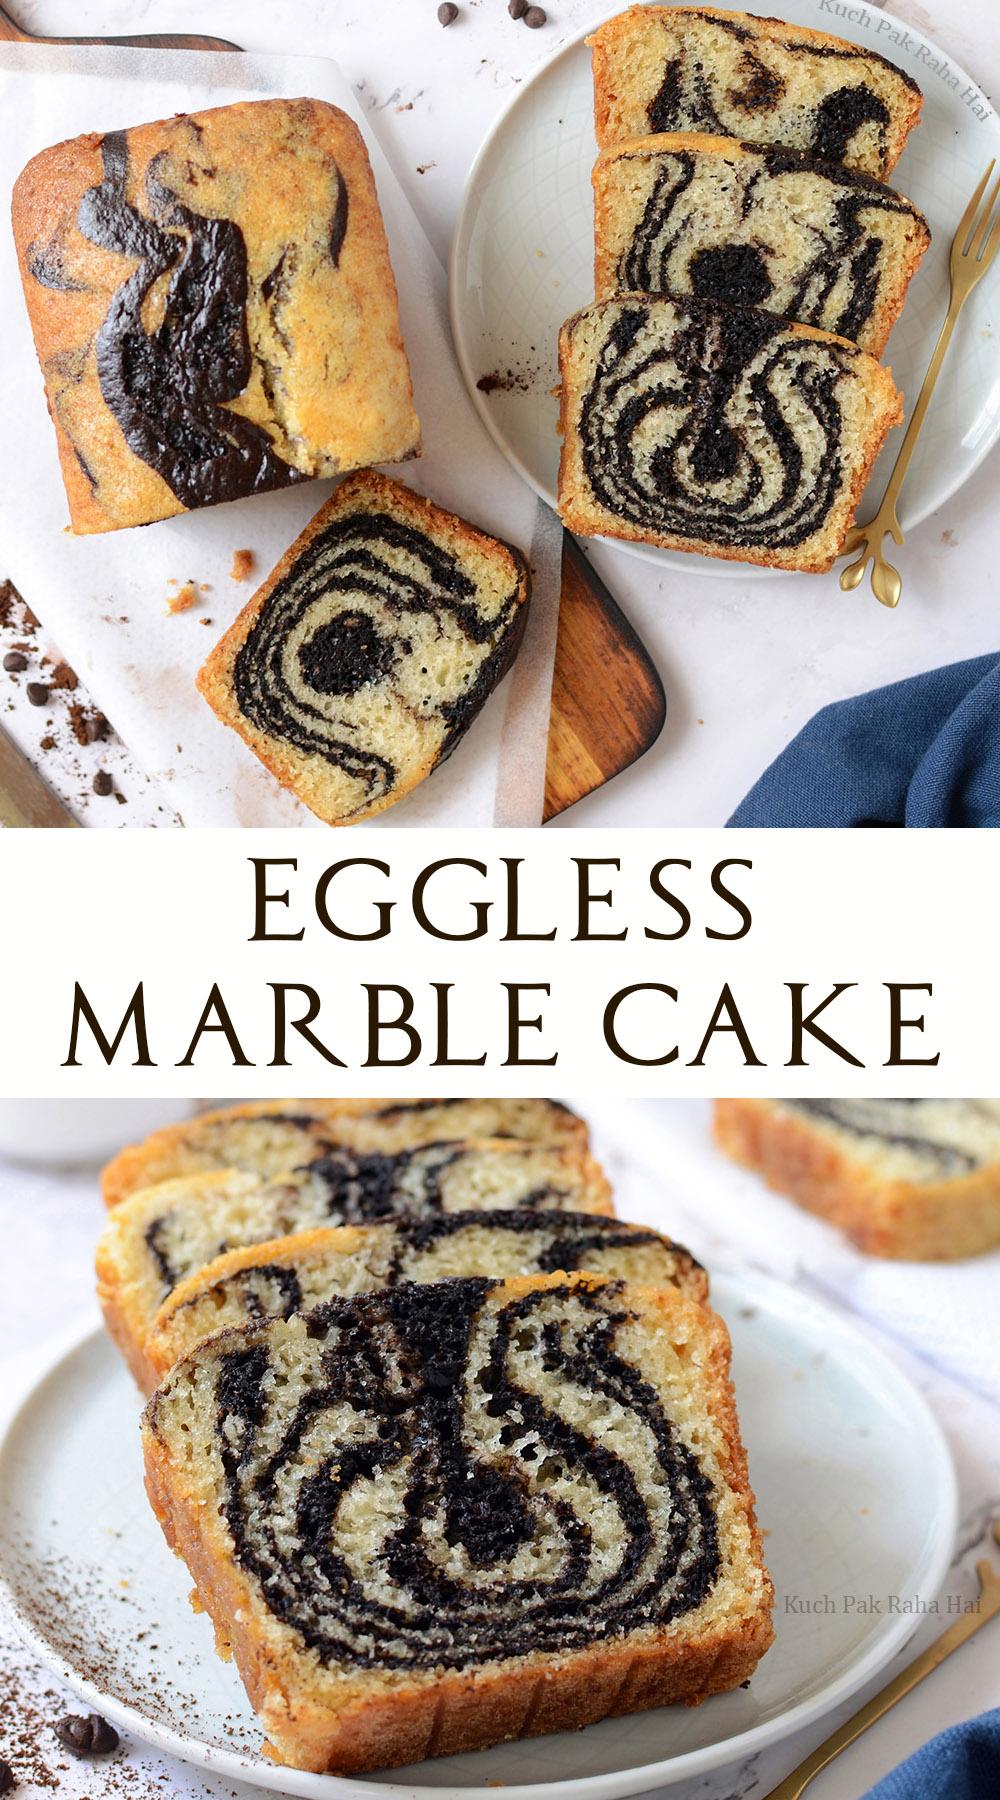 Eggless Marble Cake Zebra Cake with chocolate vanilla